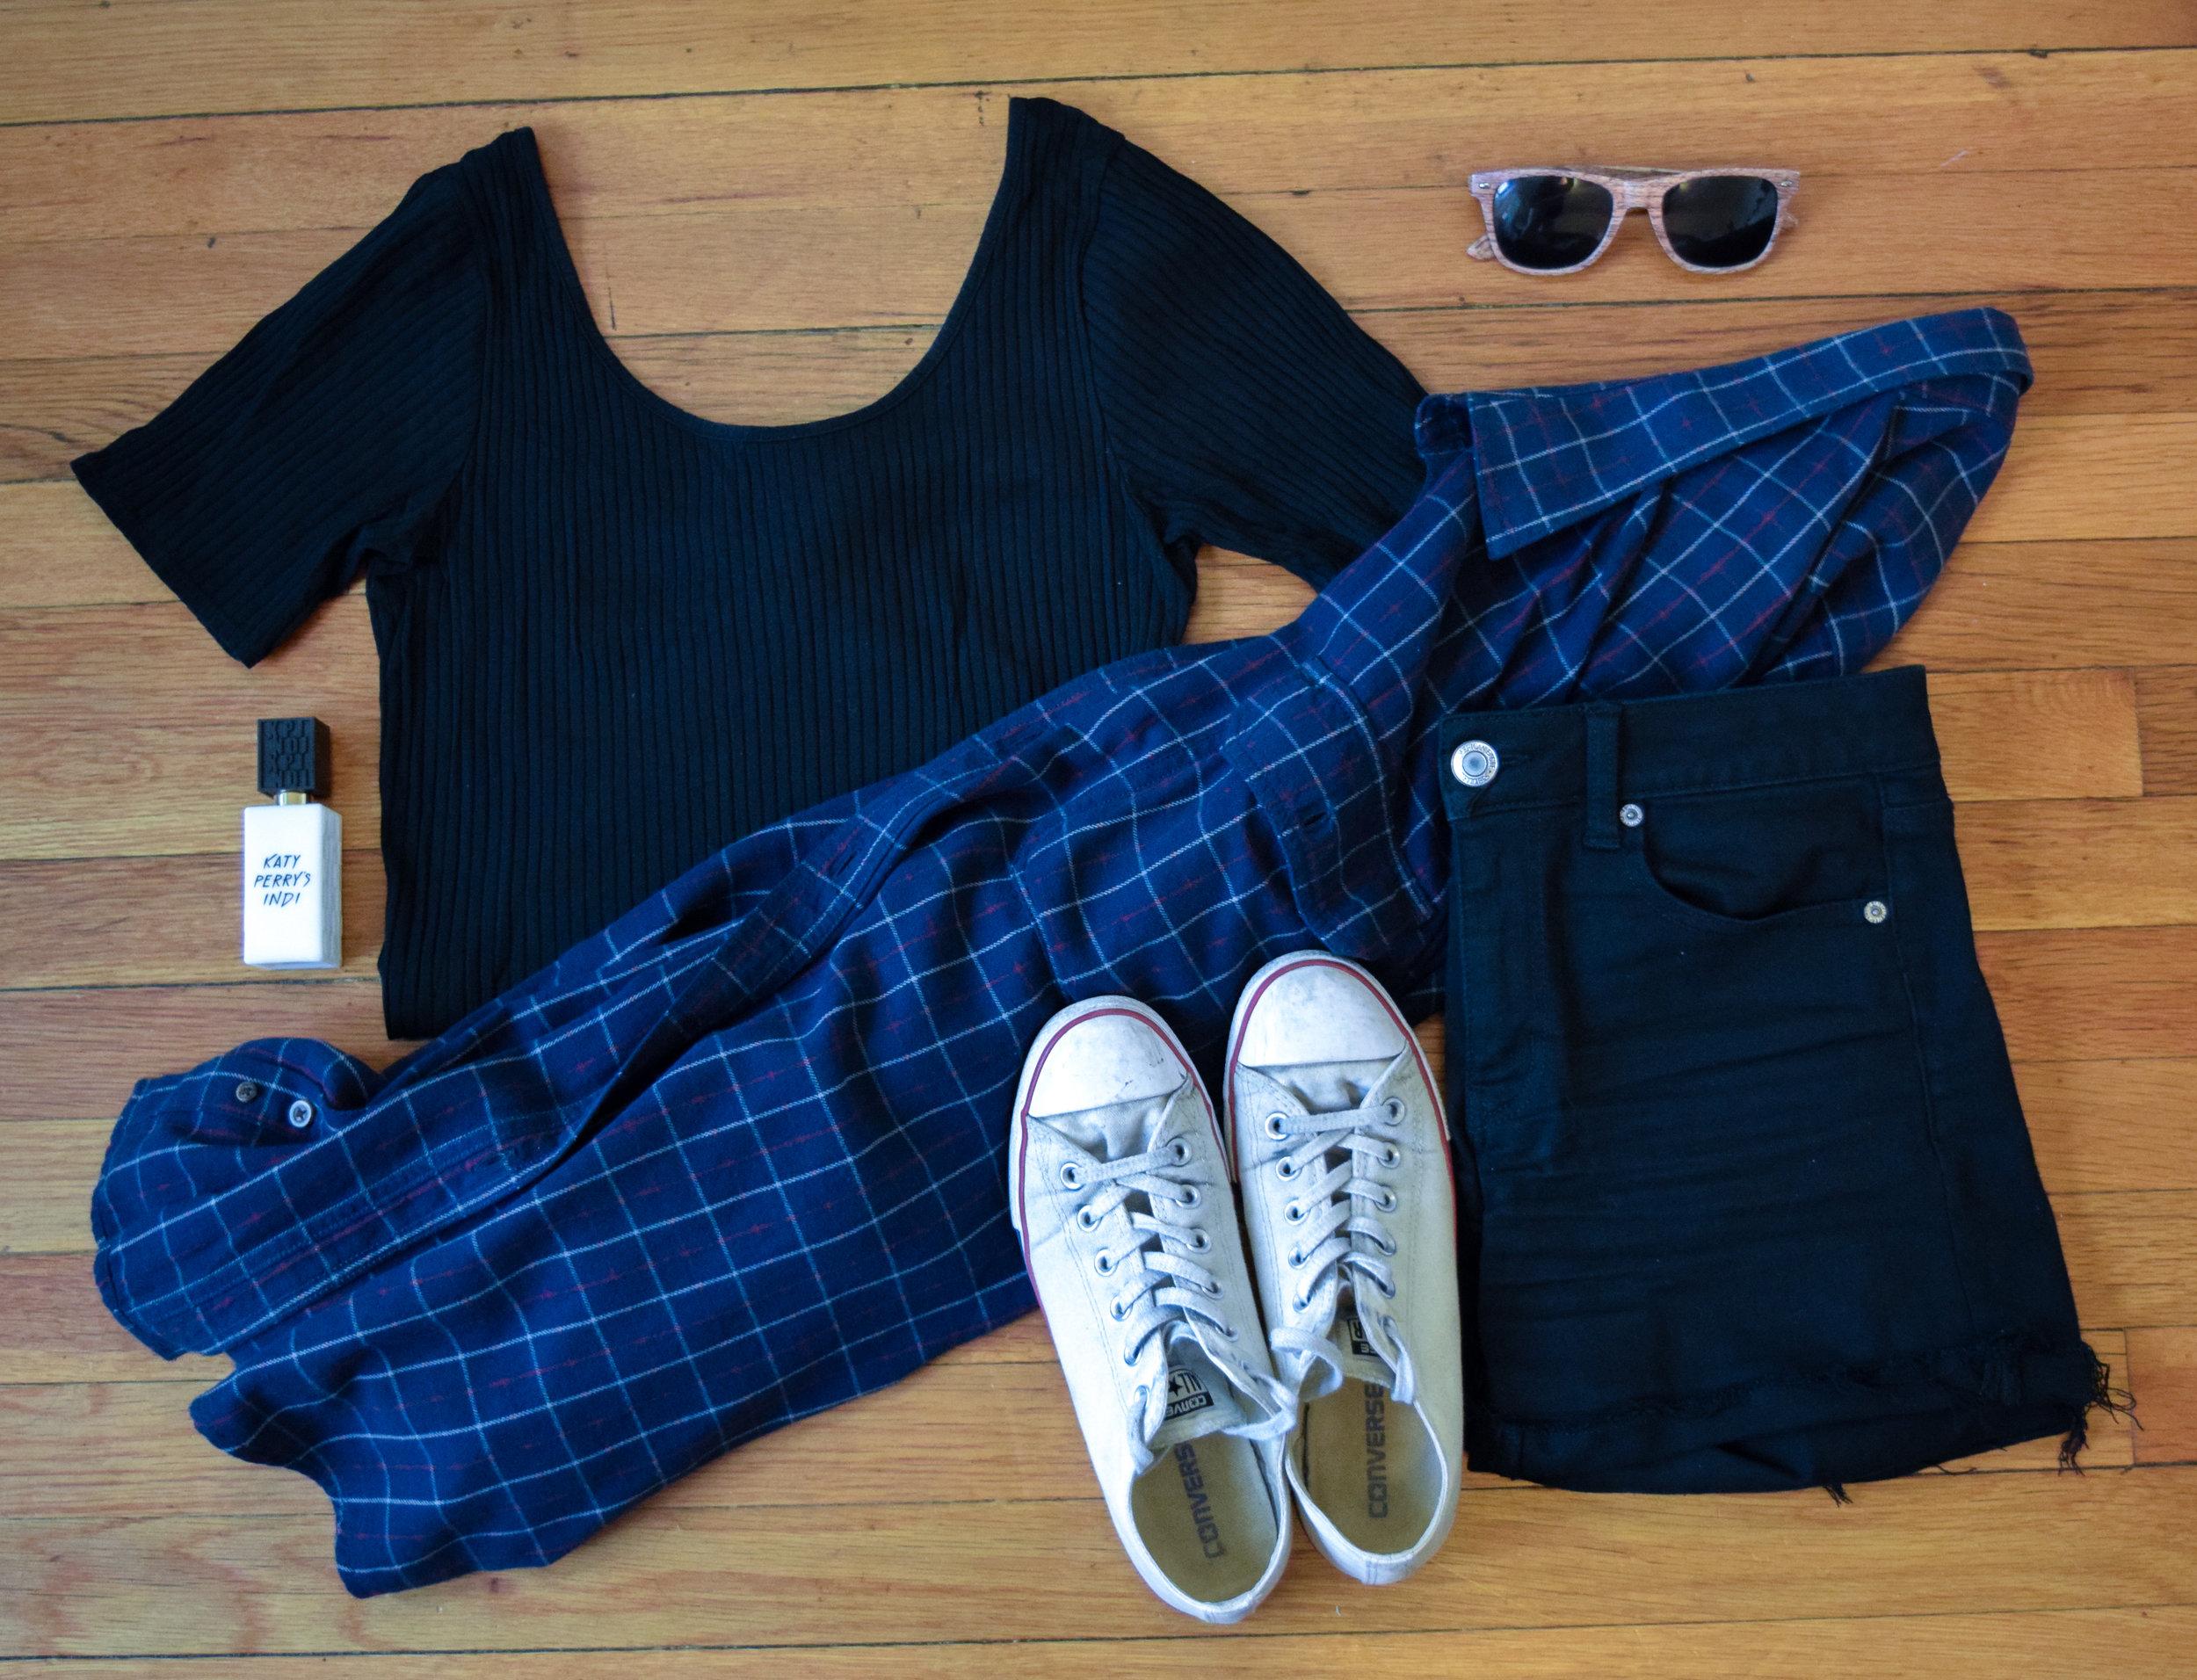 flannel (it's my dad's so i don't know, i'm sorry!).  bodysuit .  shorts .  sneakers .  perfume .  sunglasses  (similar, mine are lighter!).